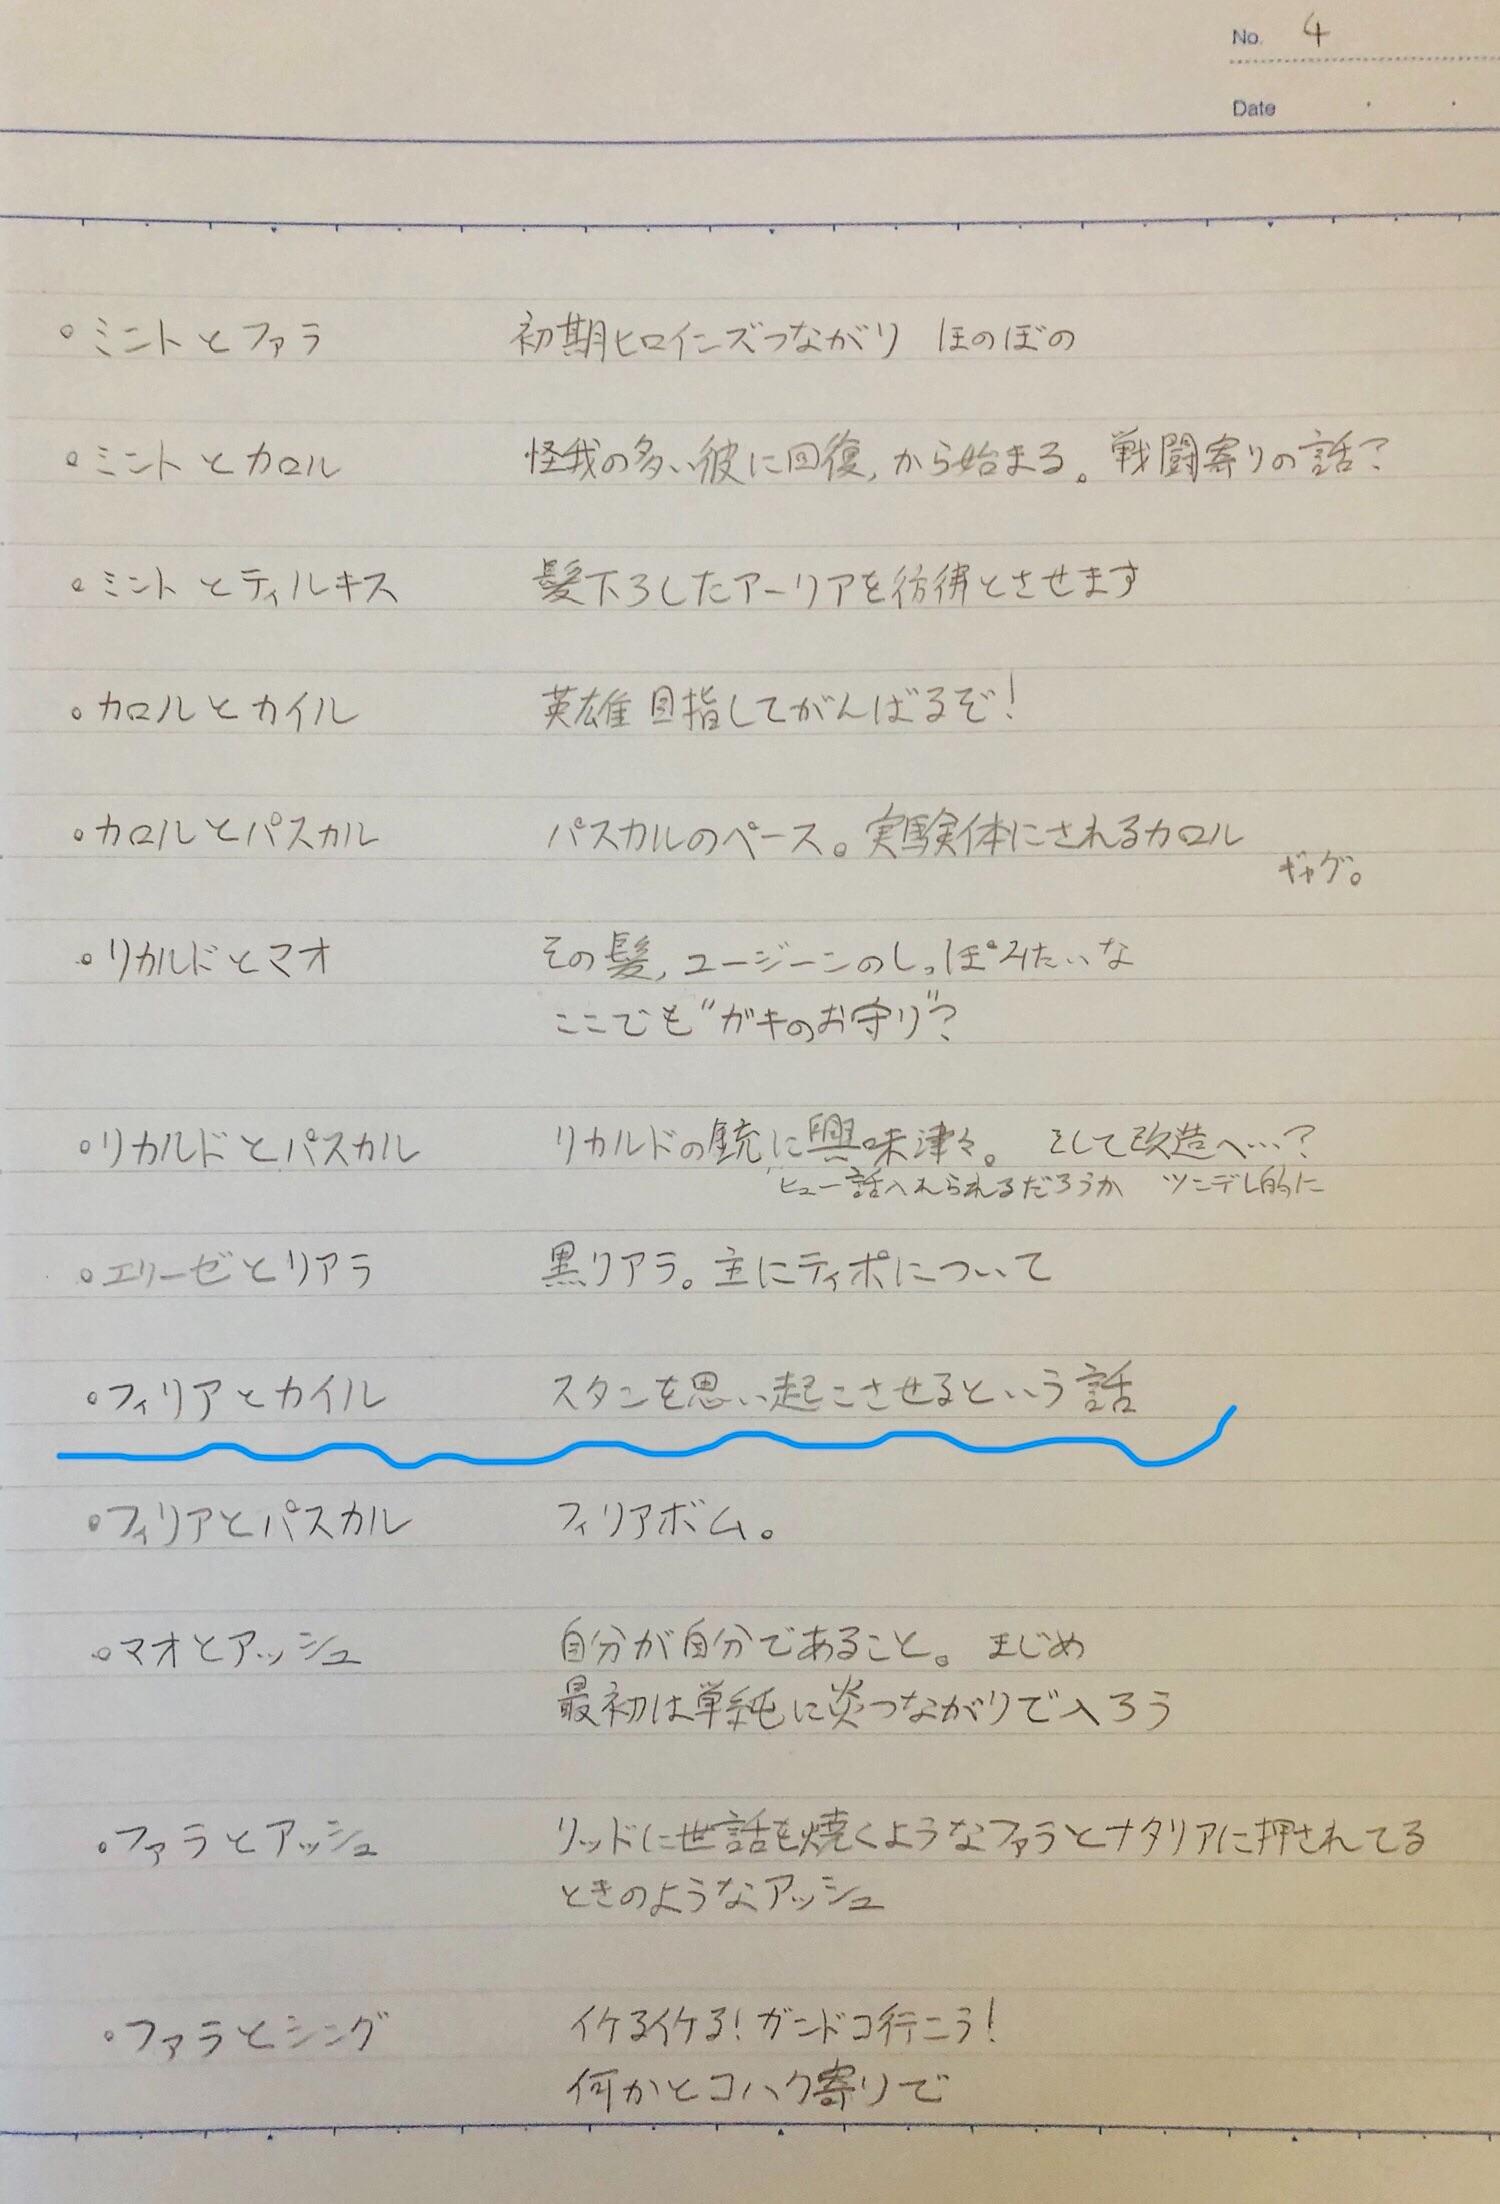 f:id:Yuki-19:20200514092014j:image